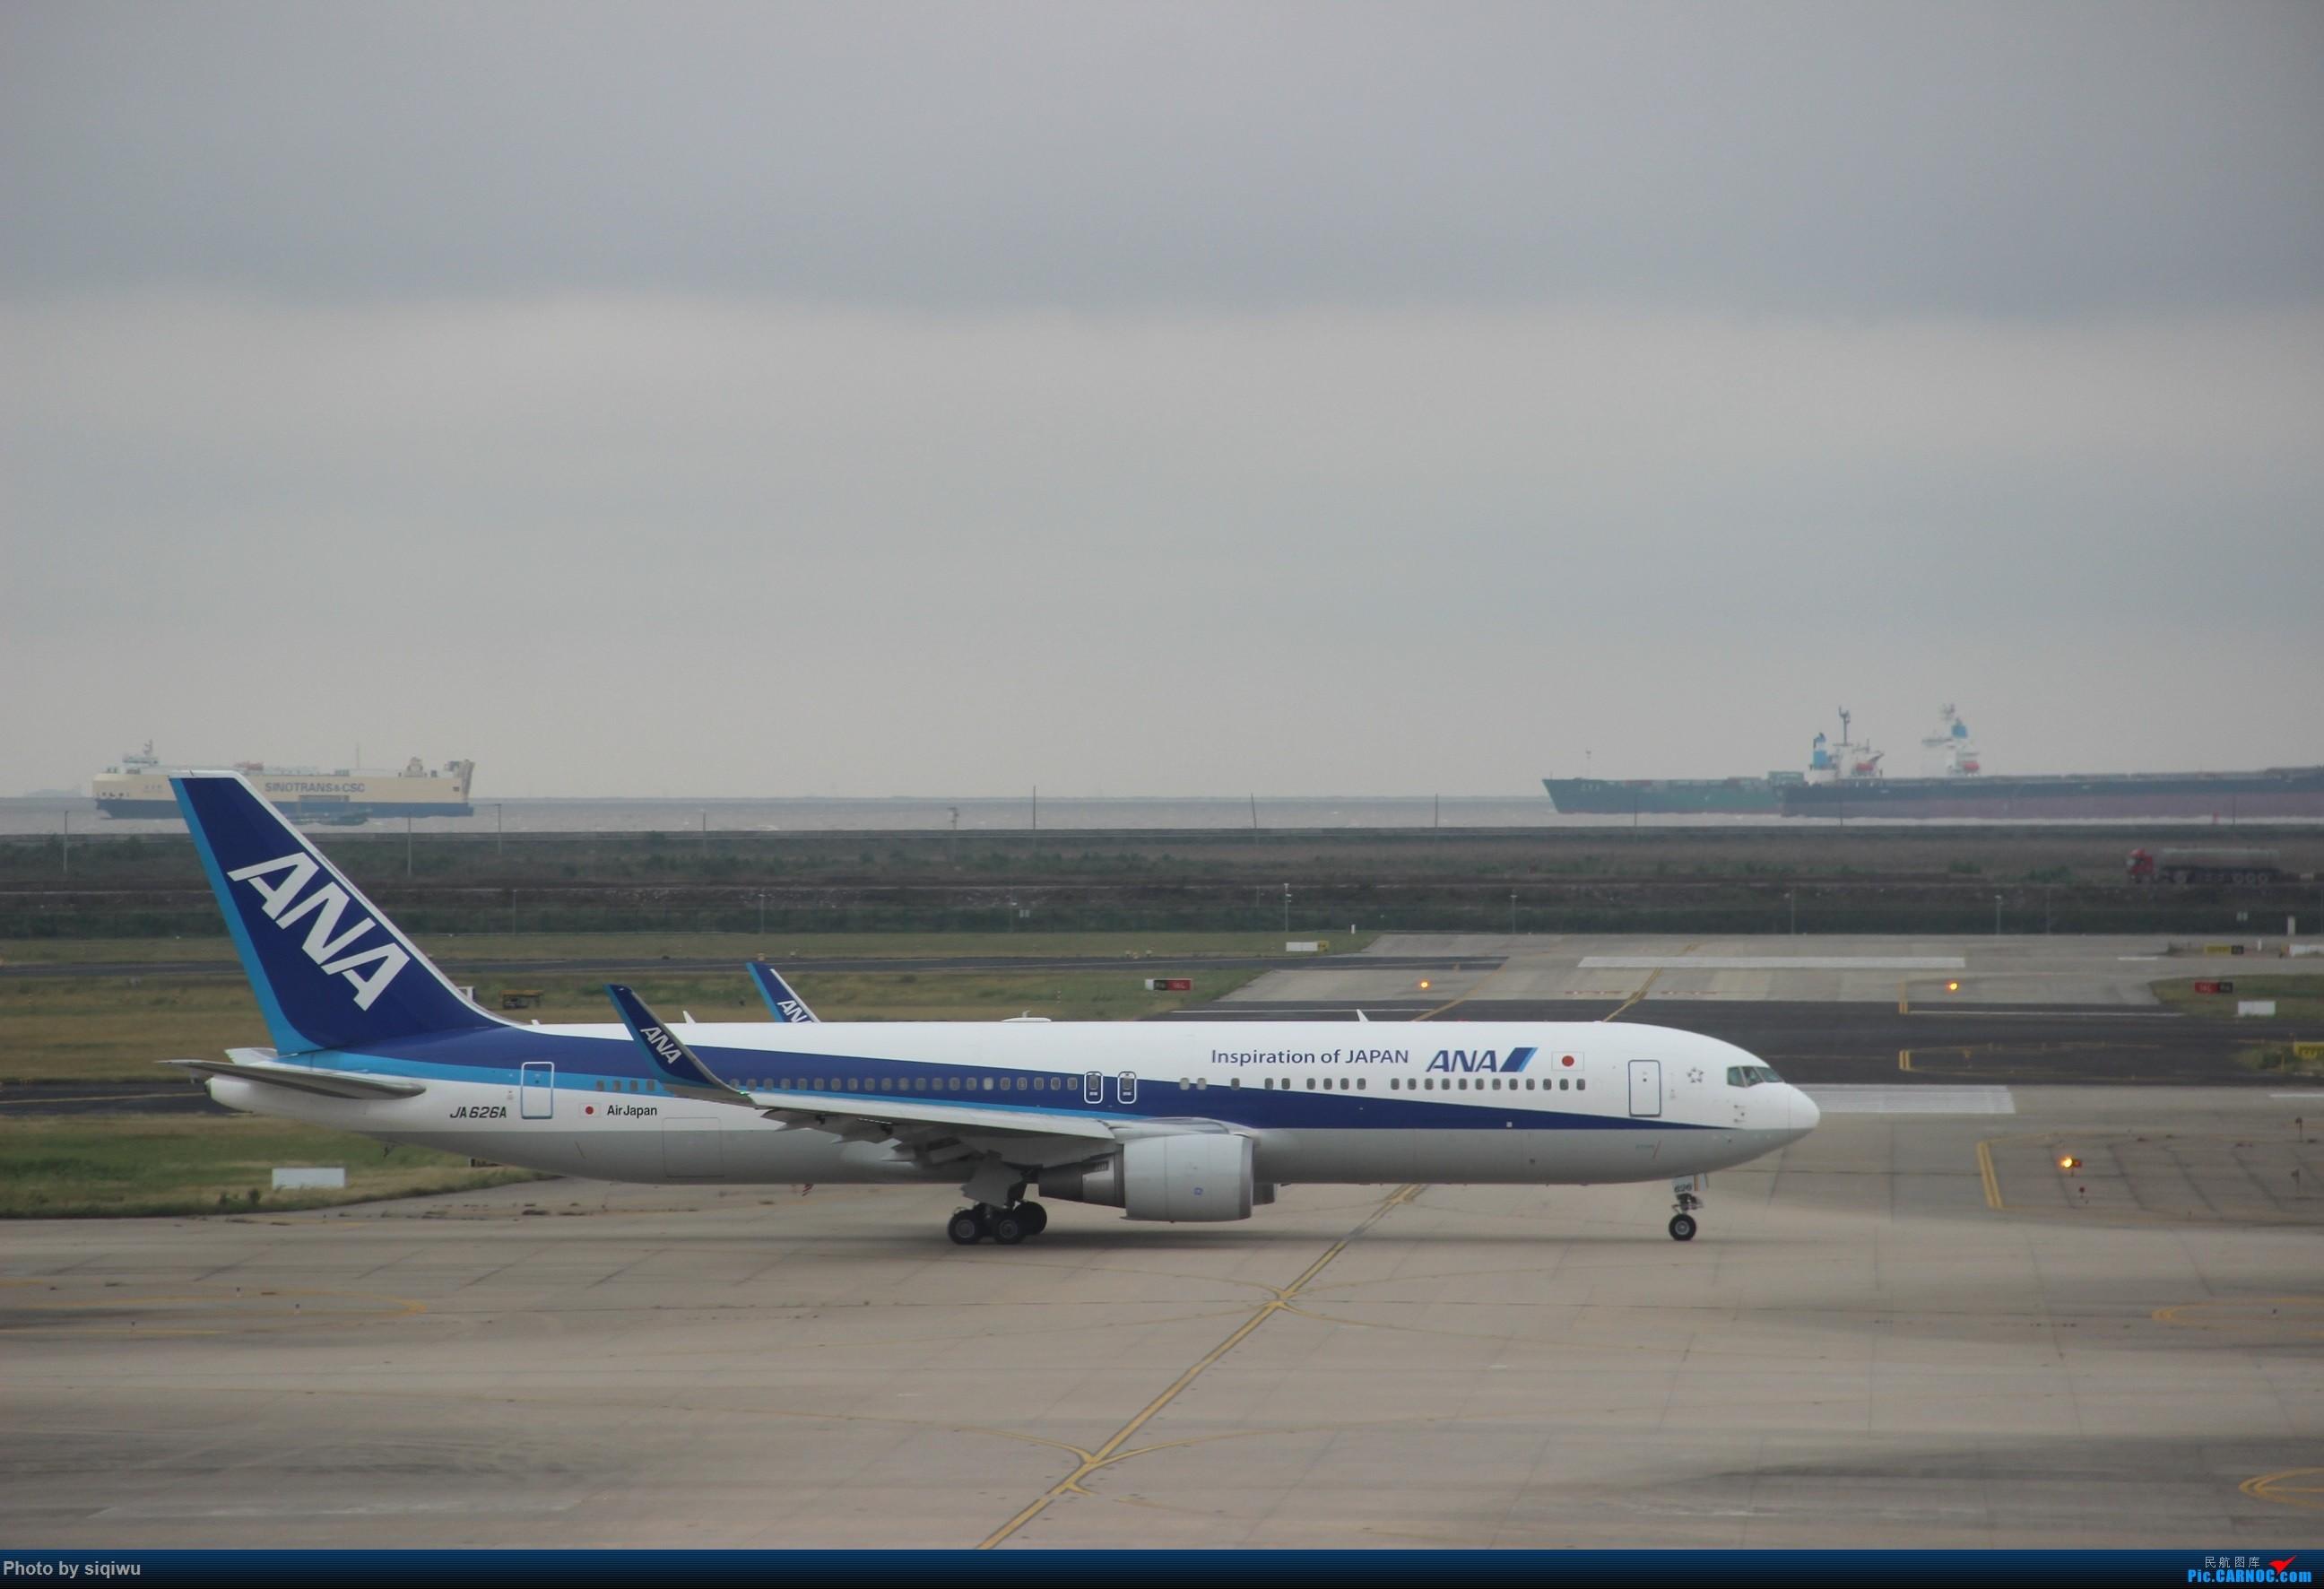 Re:[原创]PVG-HKG-KUL-HKG-PVG 四天往返,CX/KA BOEING 767-300  中国上海浦东国际机场